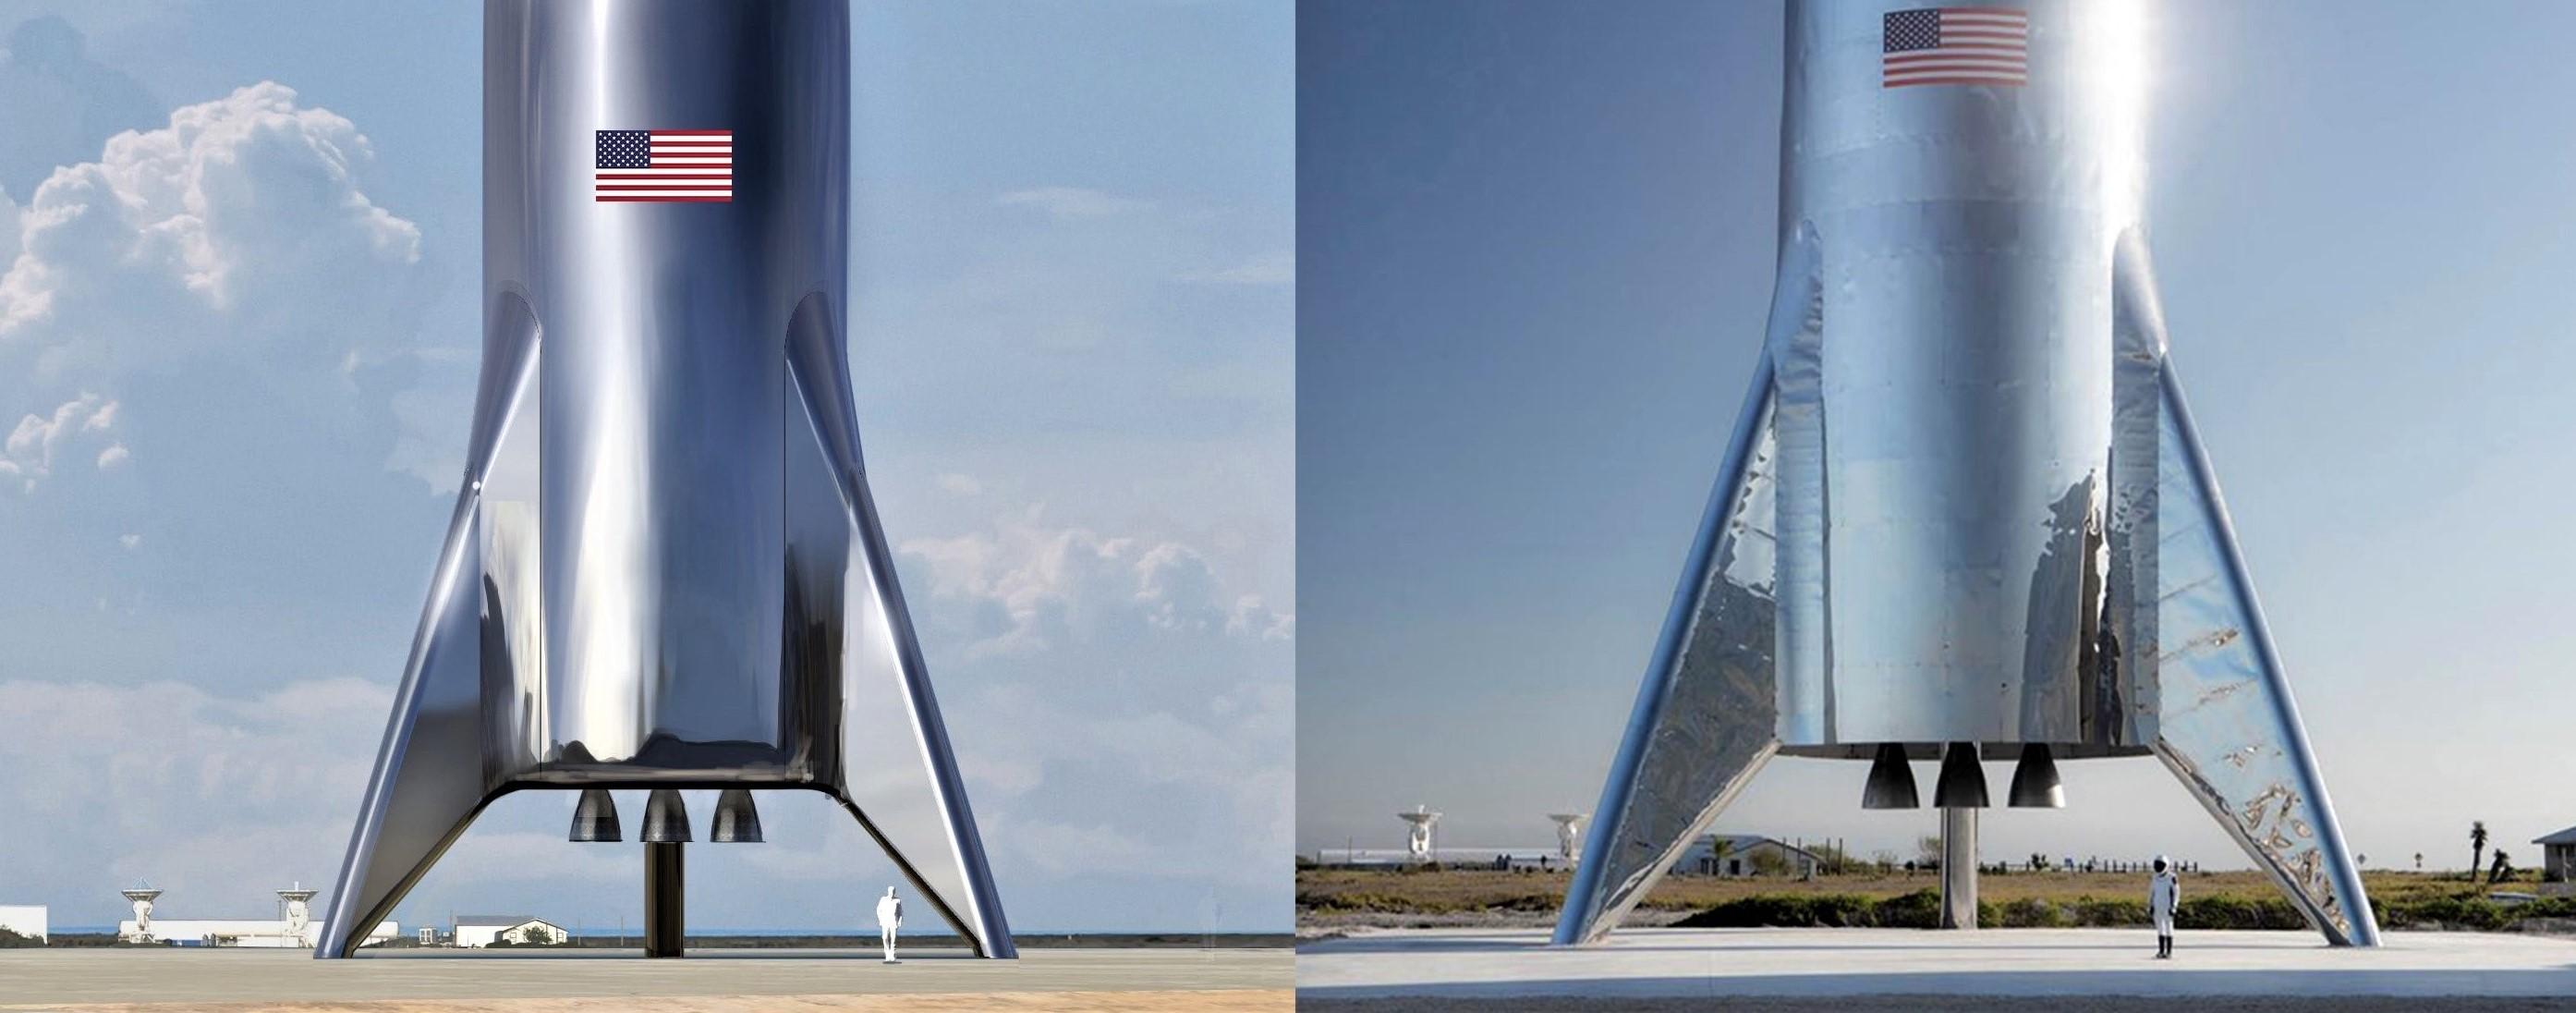 BFH BFS Starhopper render and photo (Elon Musk) 1